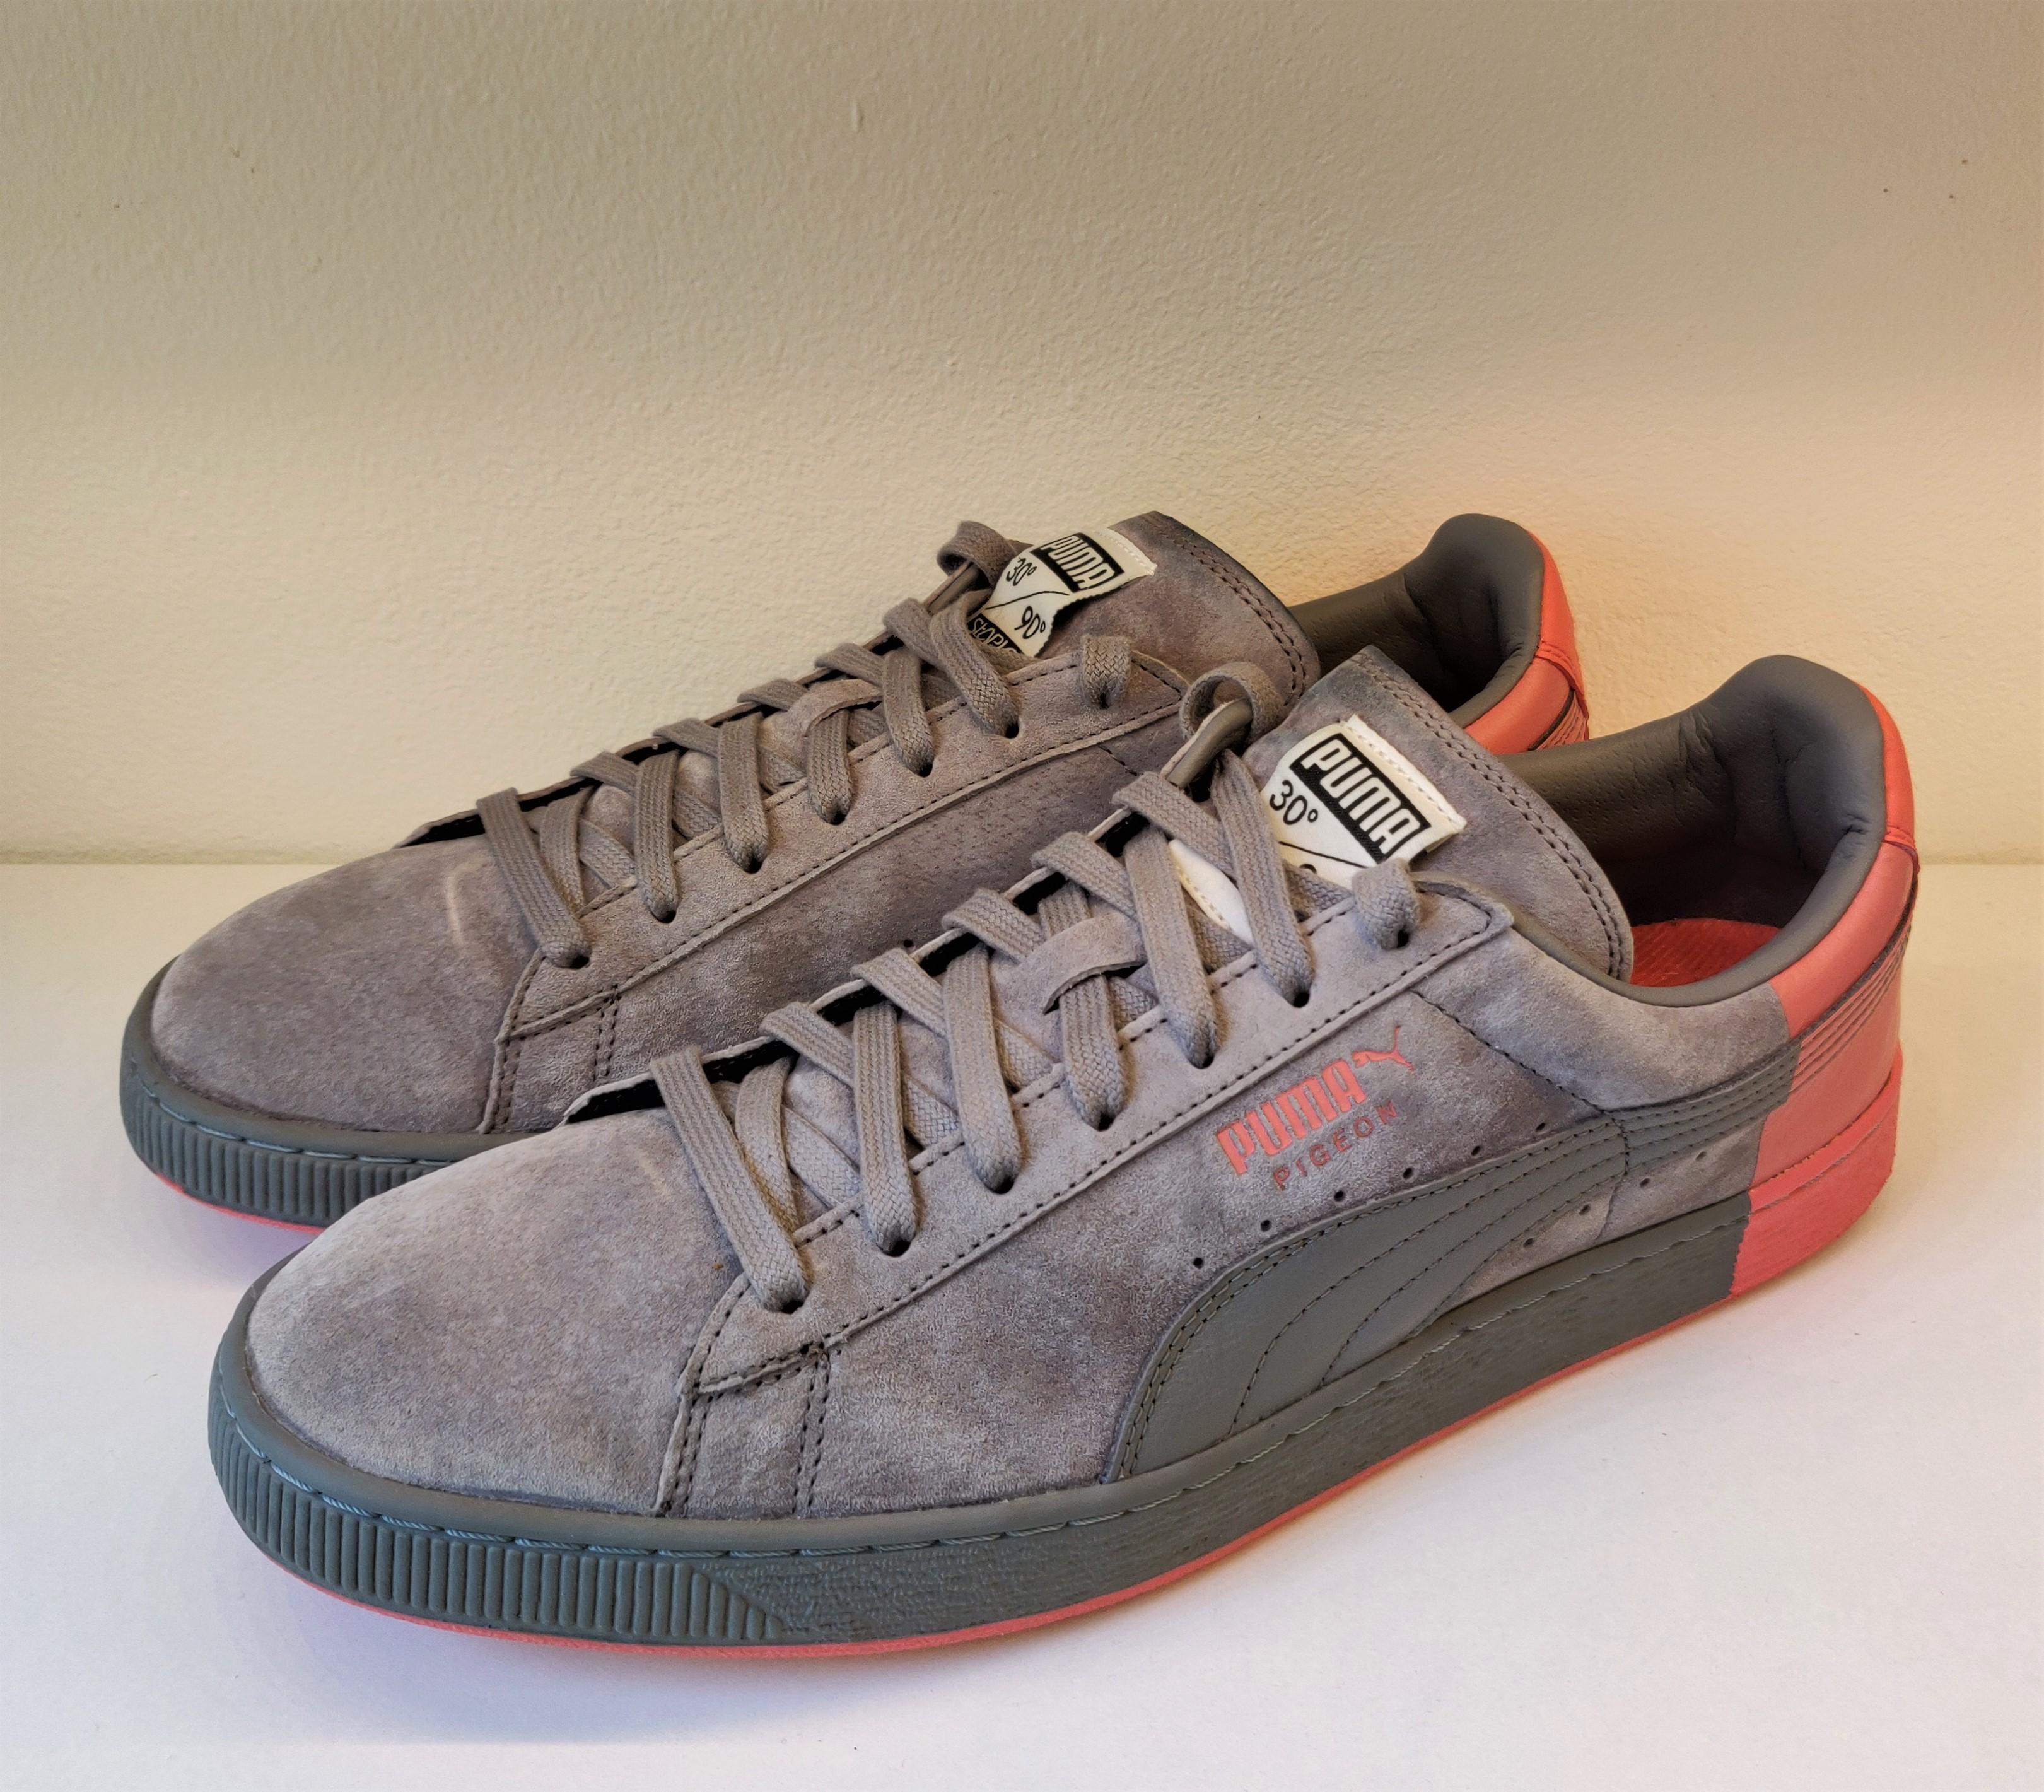 Puma Suede X Staple Frost Grey